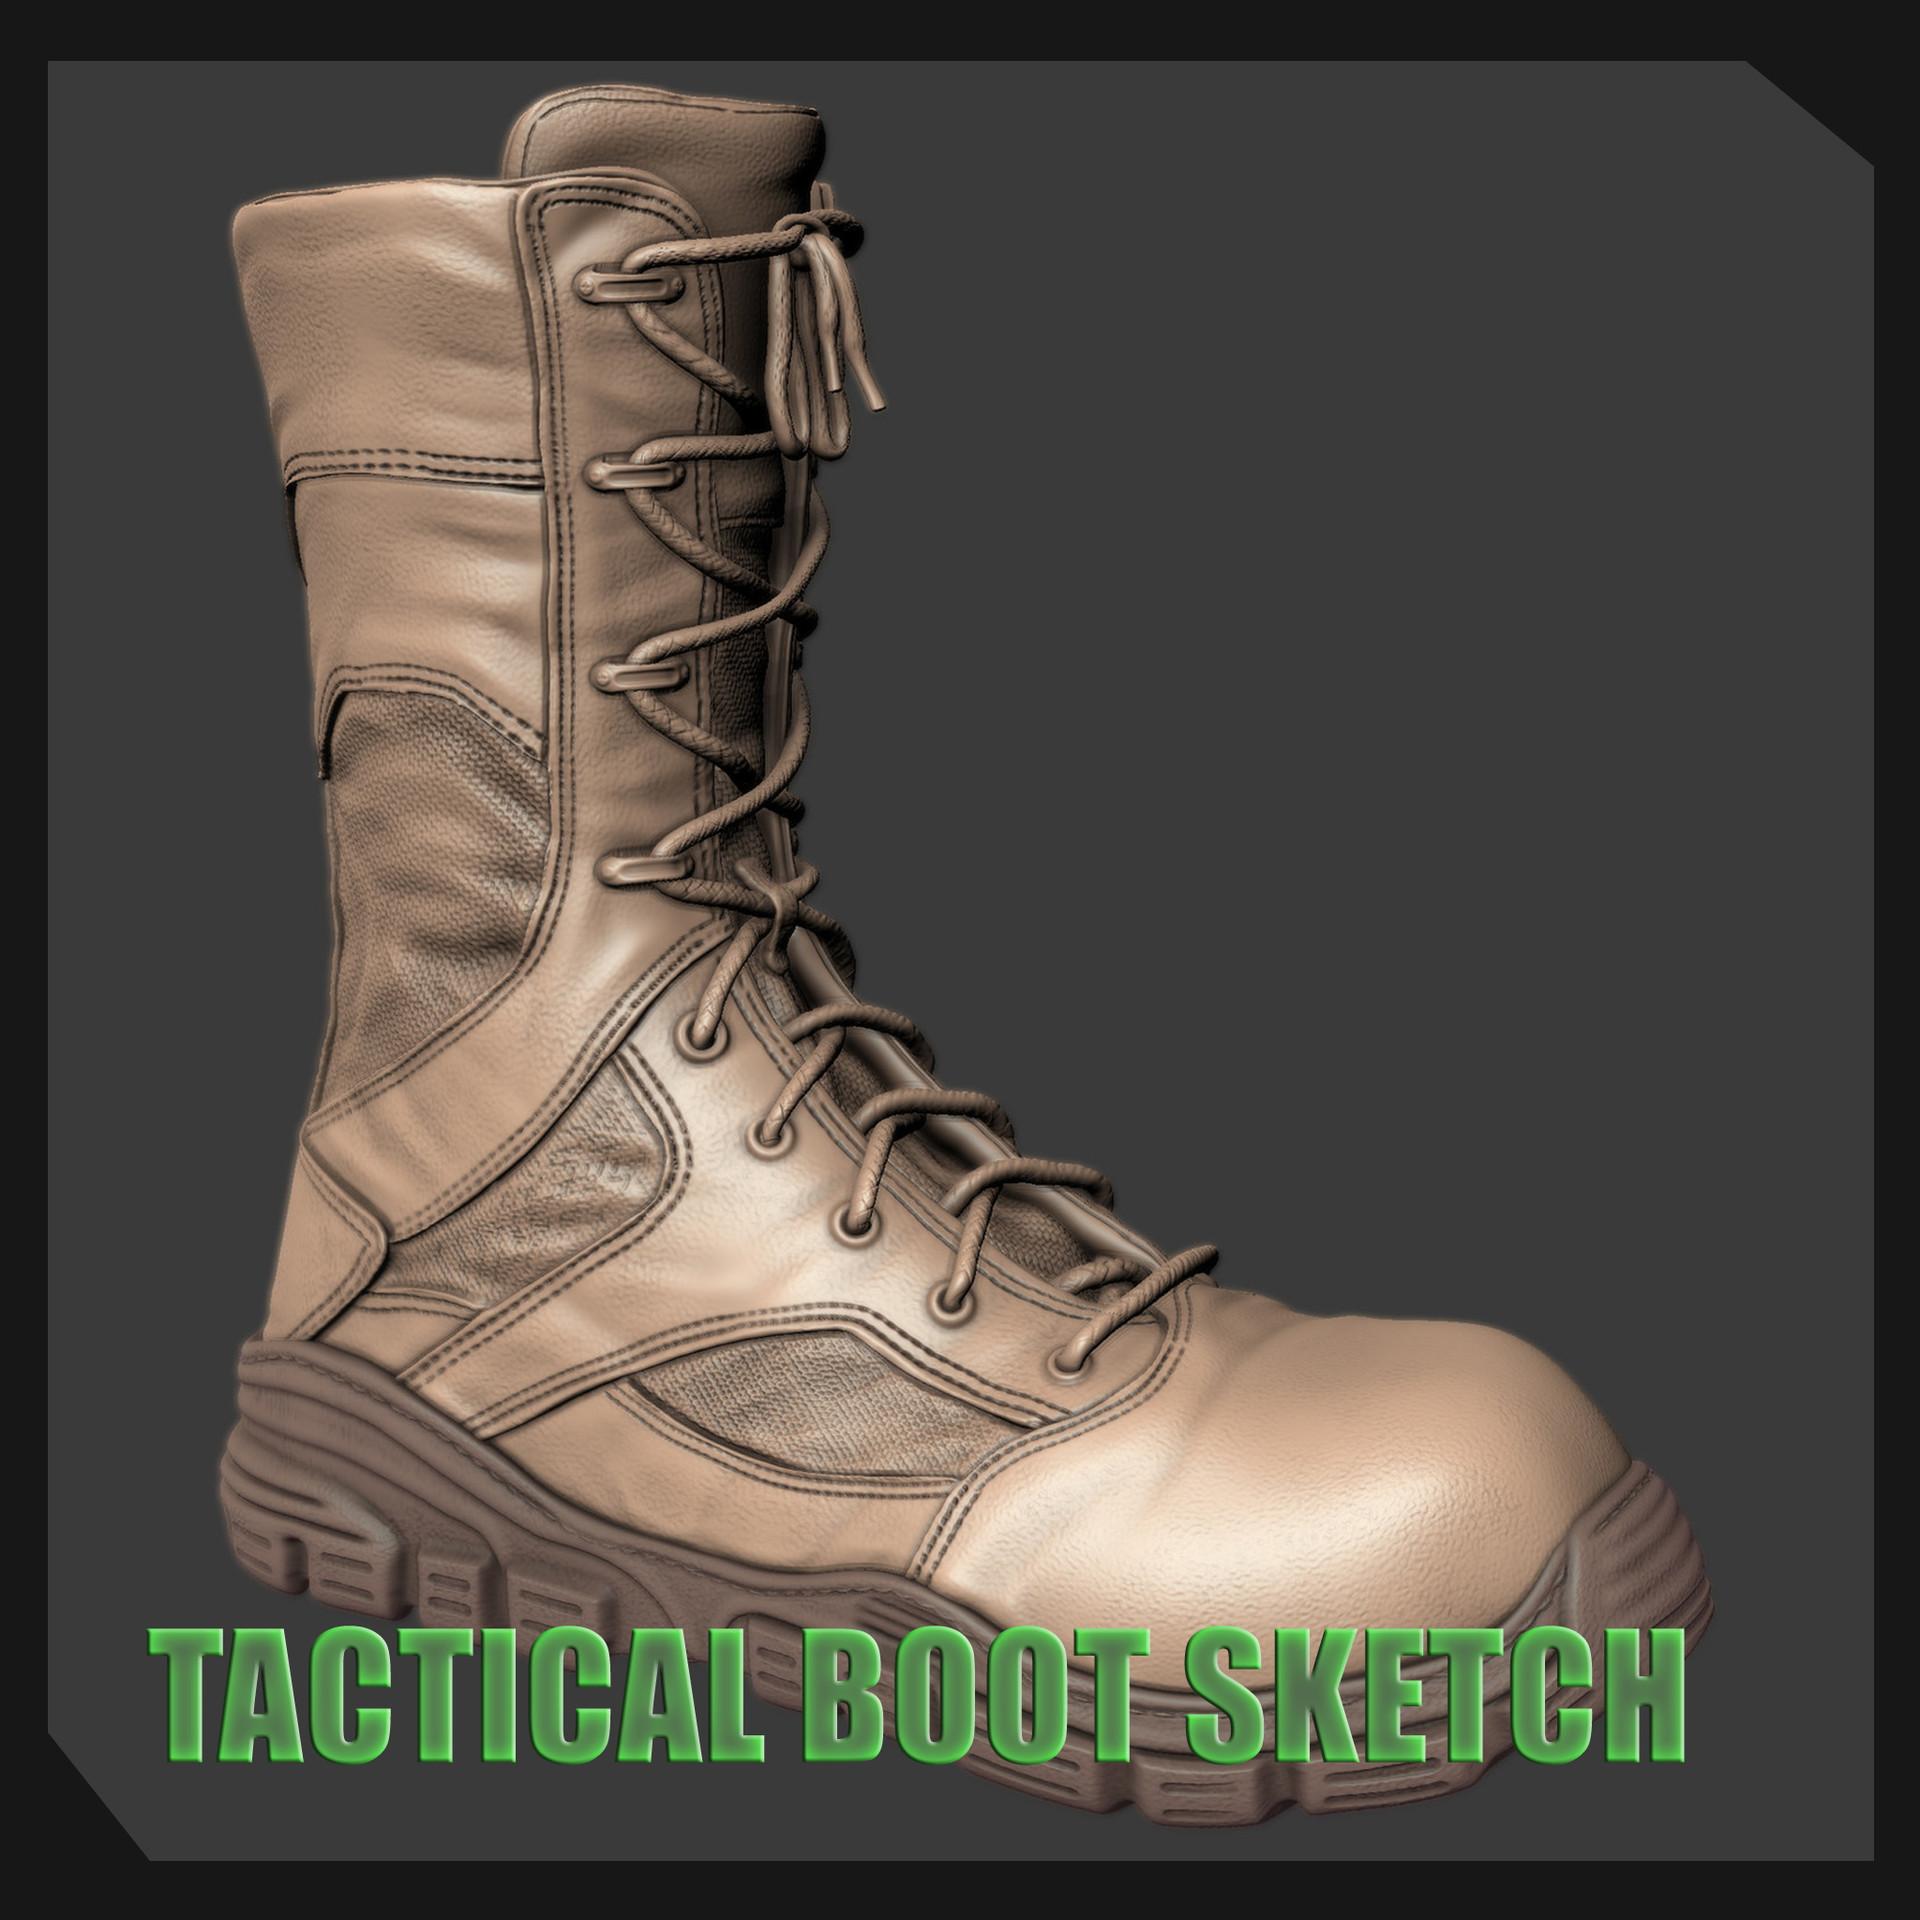 Tactical Boots Sketch